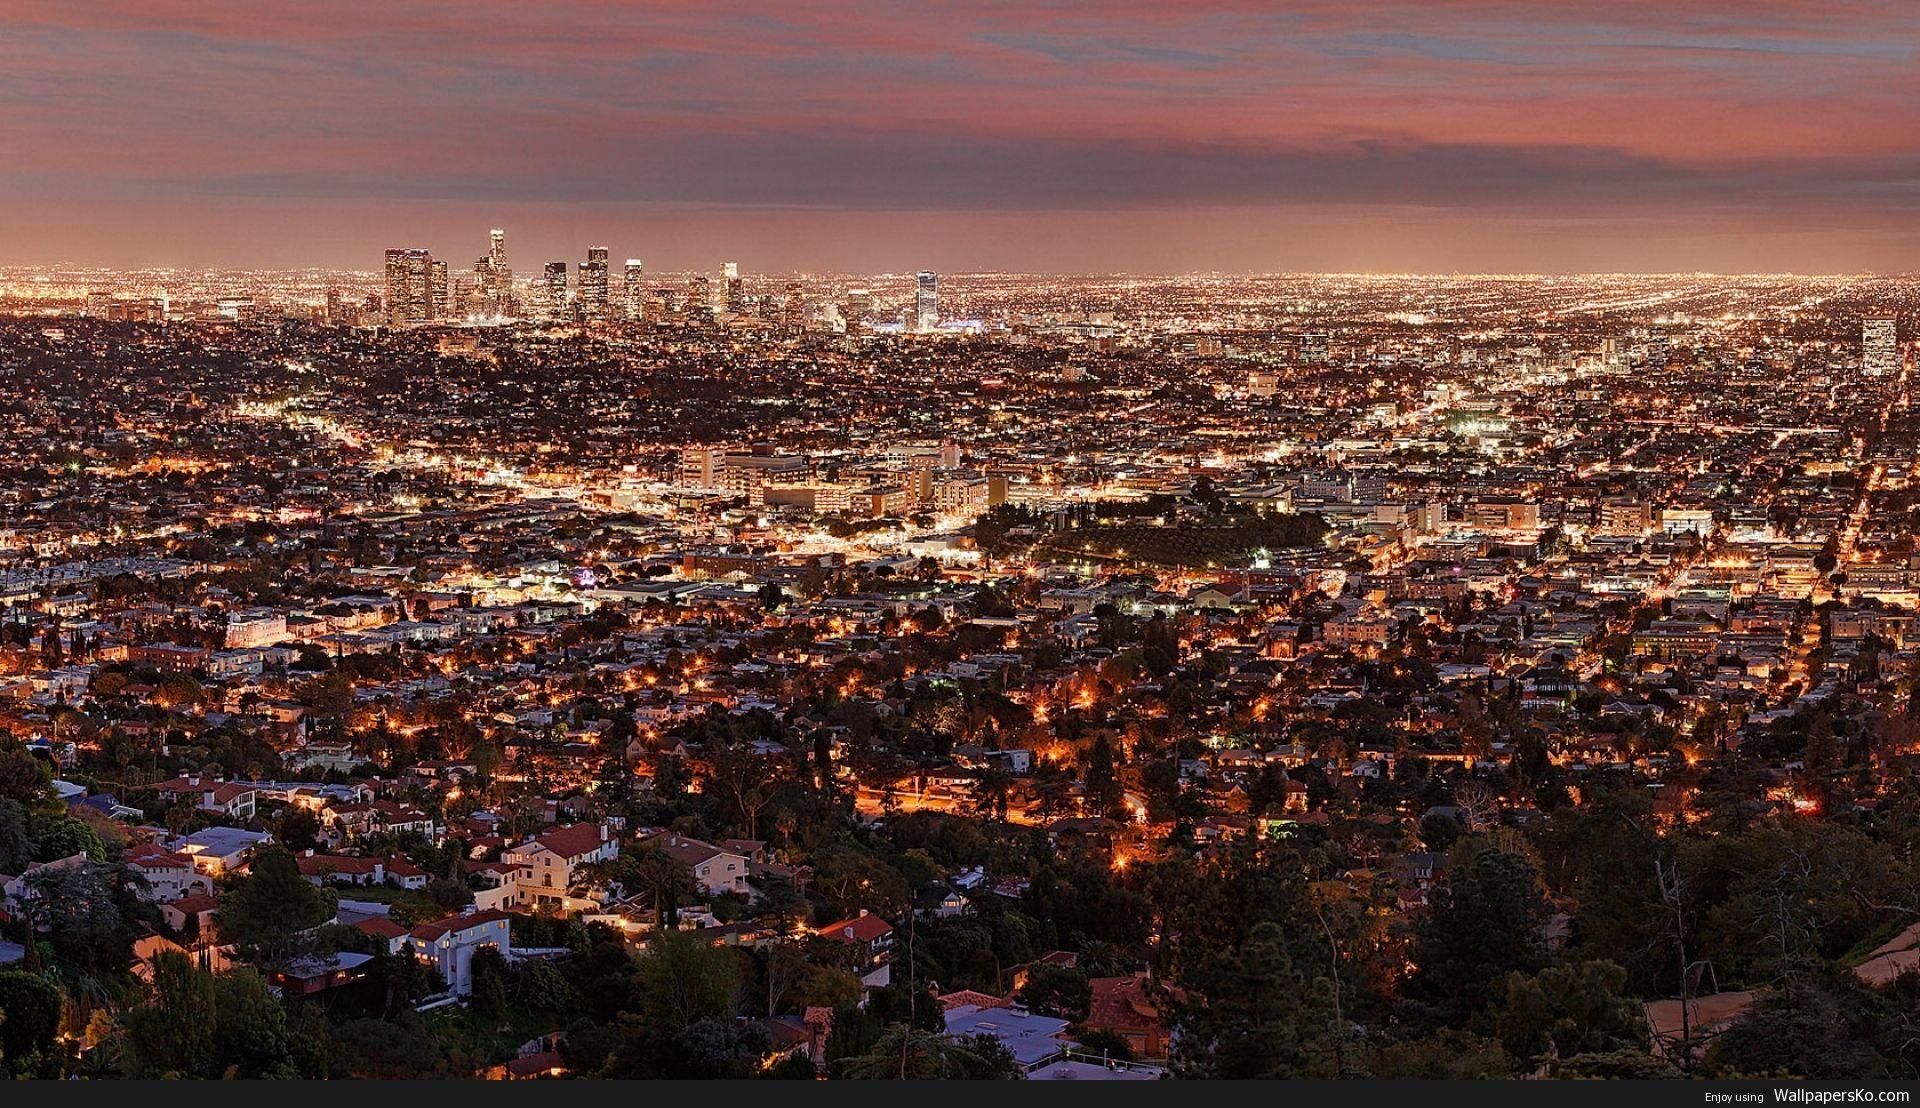 Los Angeles 1920x1080 Http Wallpapersko Com Los Angeles 1920x1080 Html Hd Wallpapers Downloa Los Angeles Wallpaper City Los Angeles California Photography